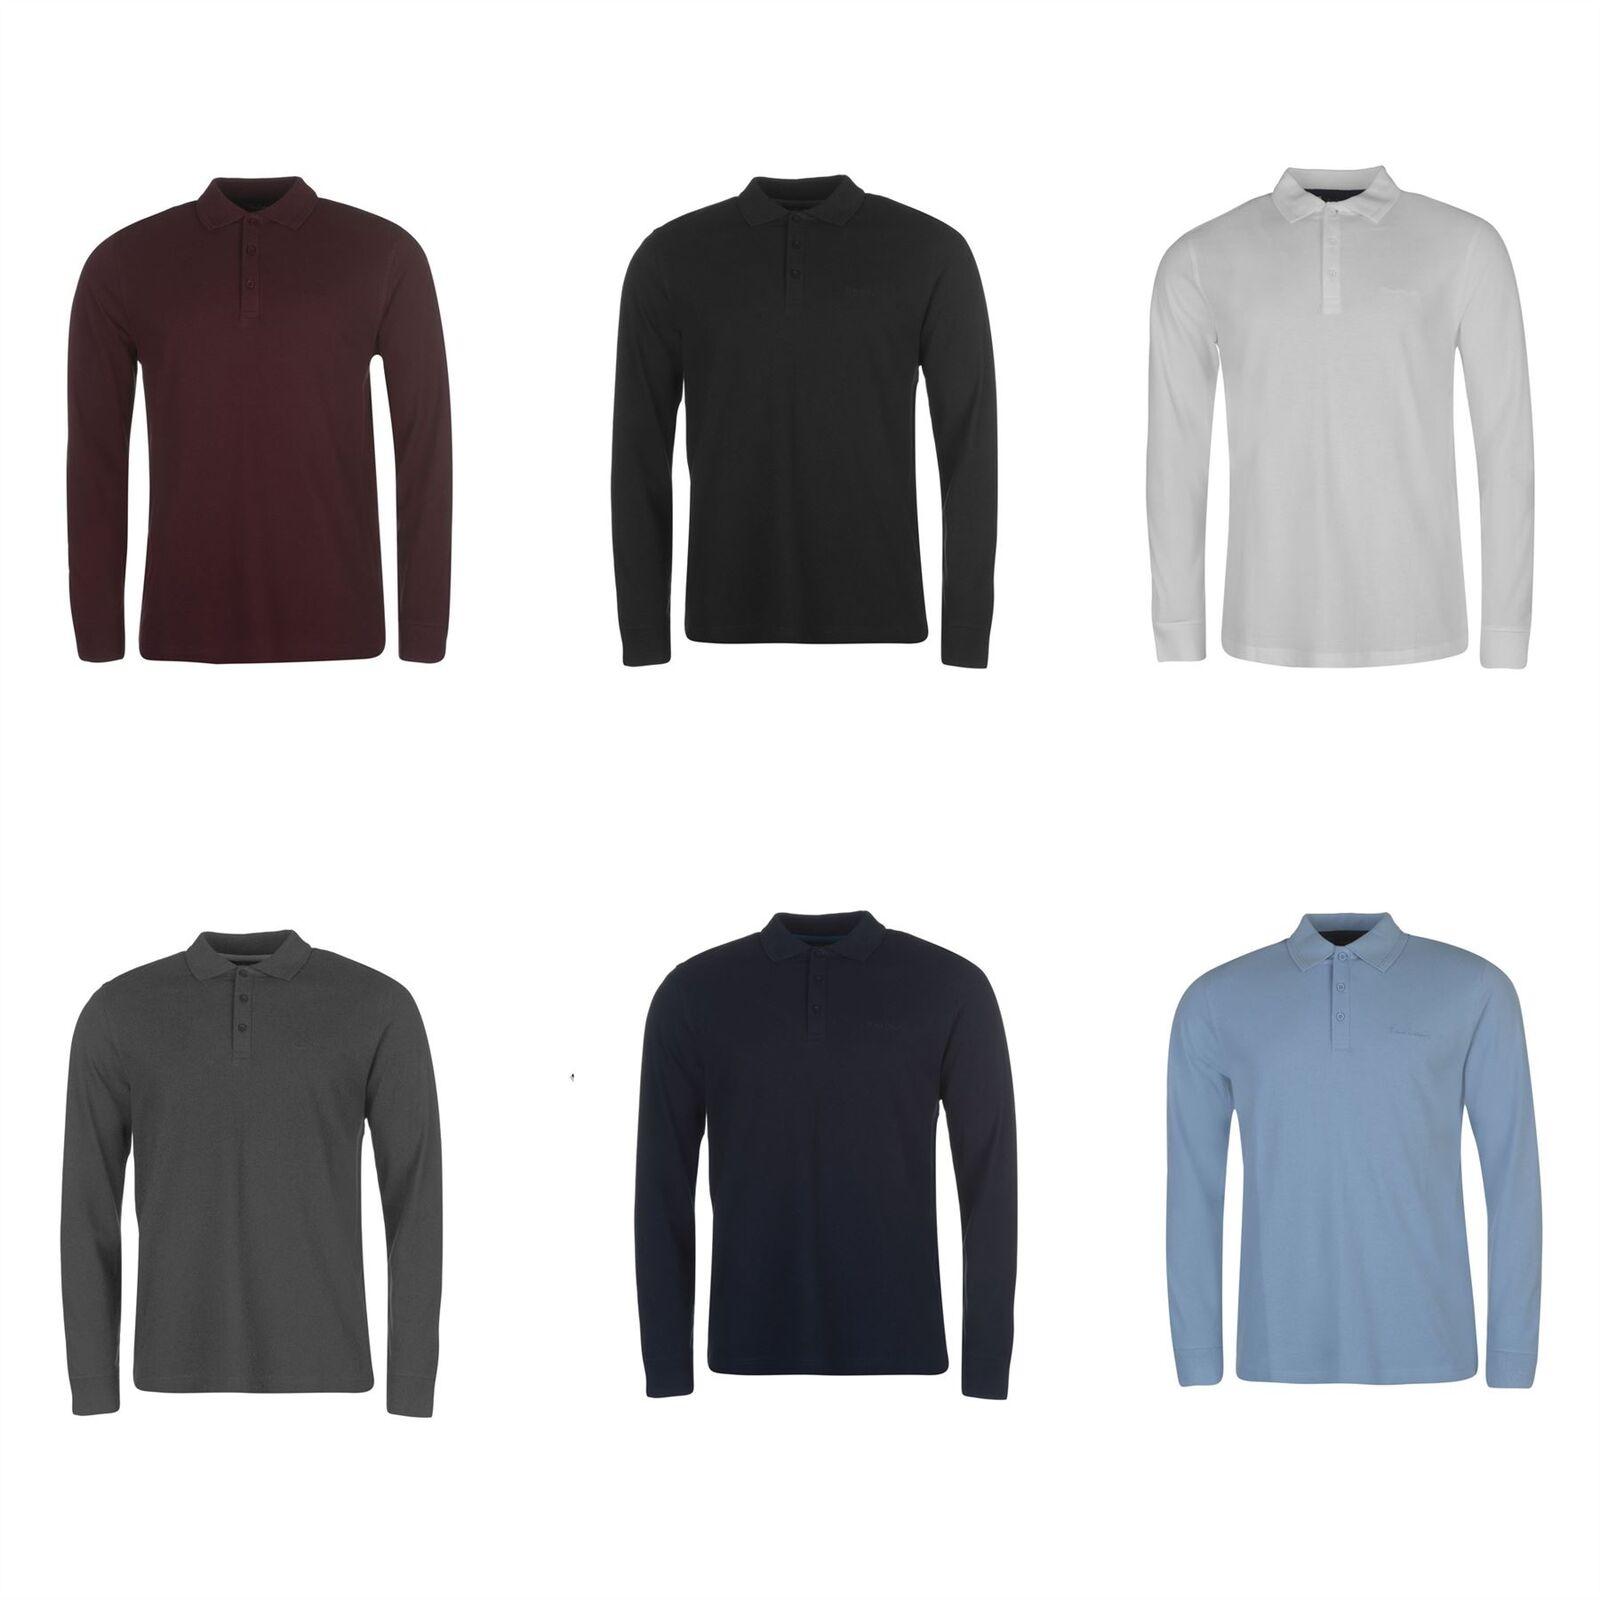 Pierre Cardin Long Sleeve Plain Polo Shirt Mens Top Tee Casual T-Shirt